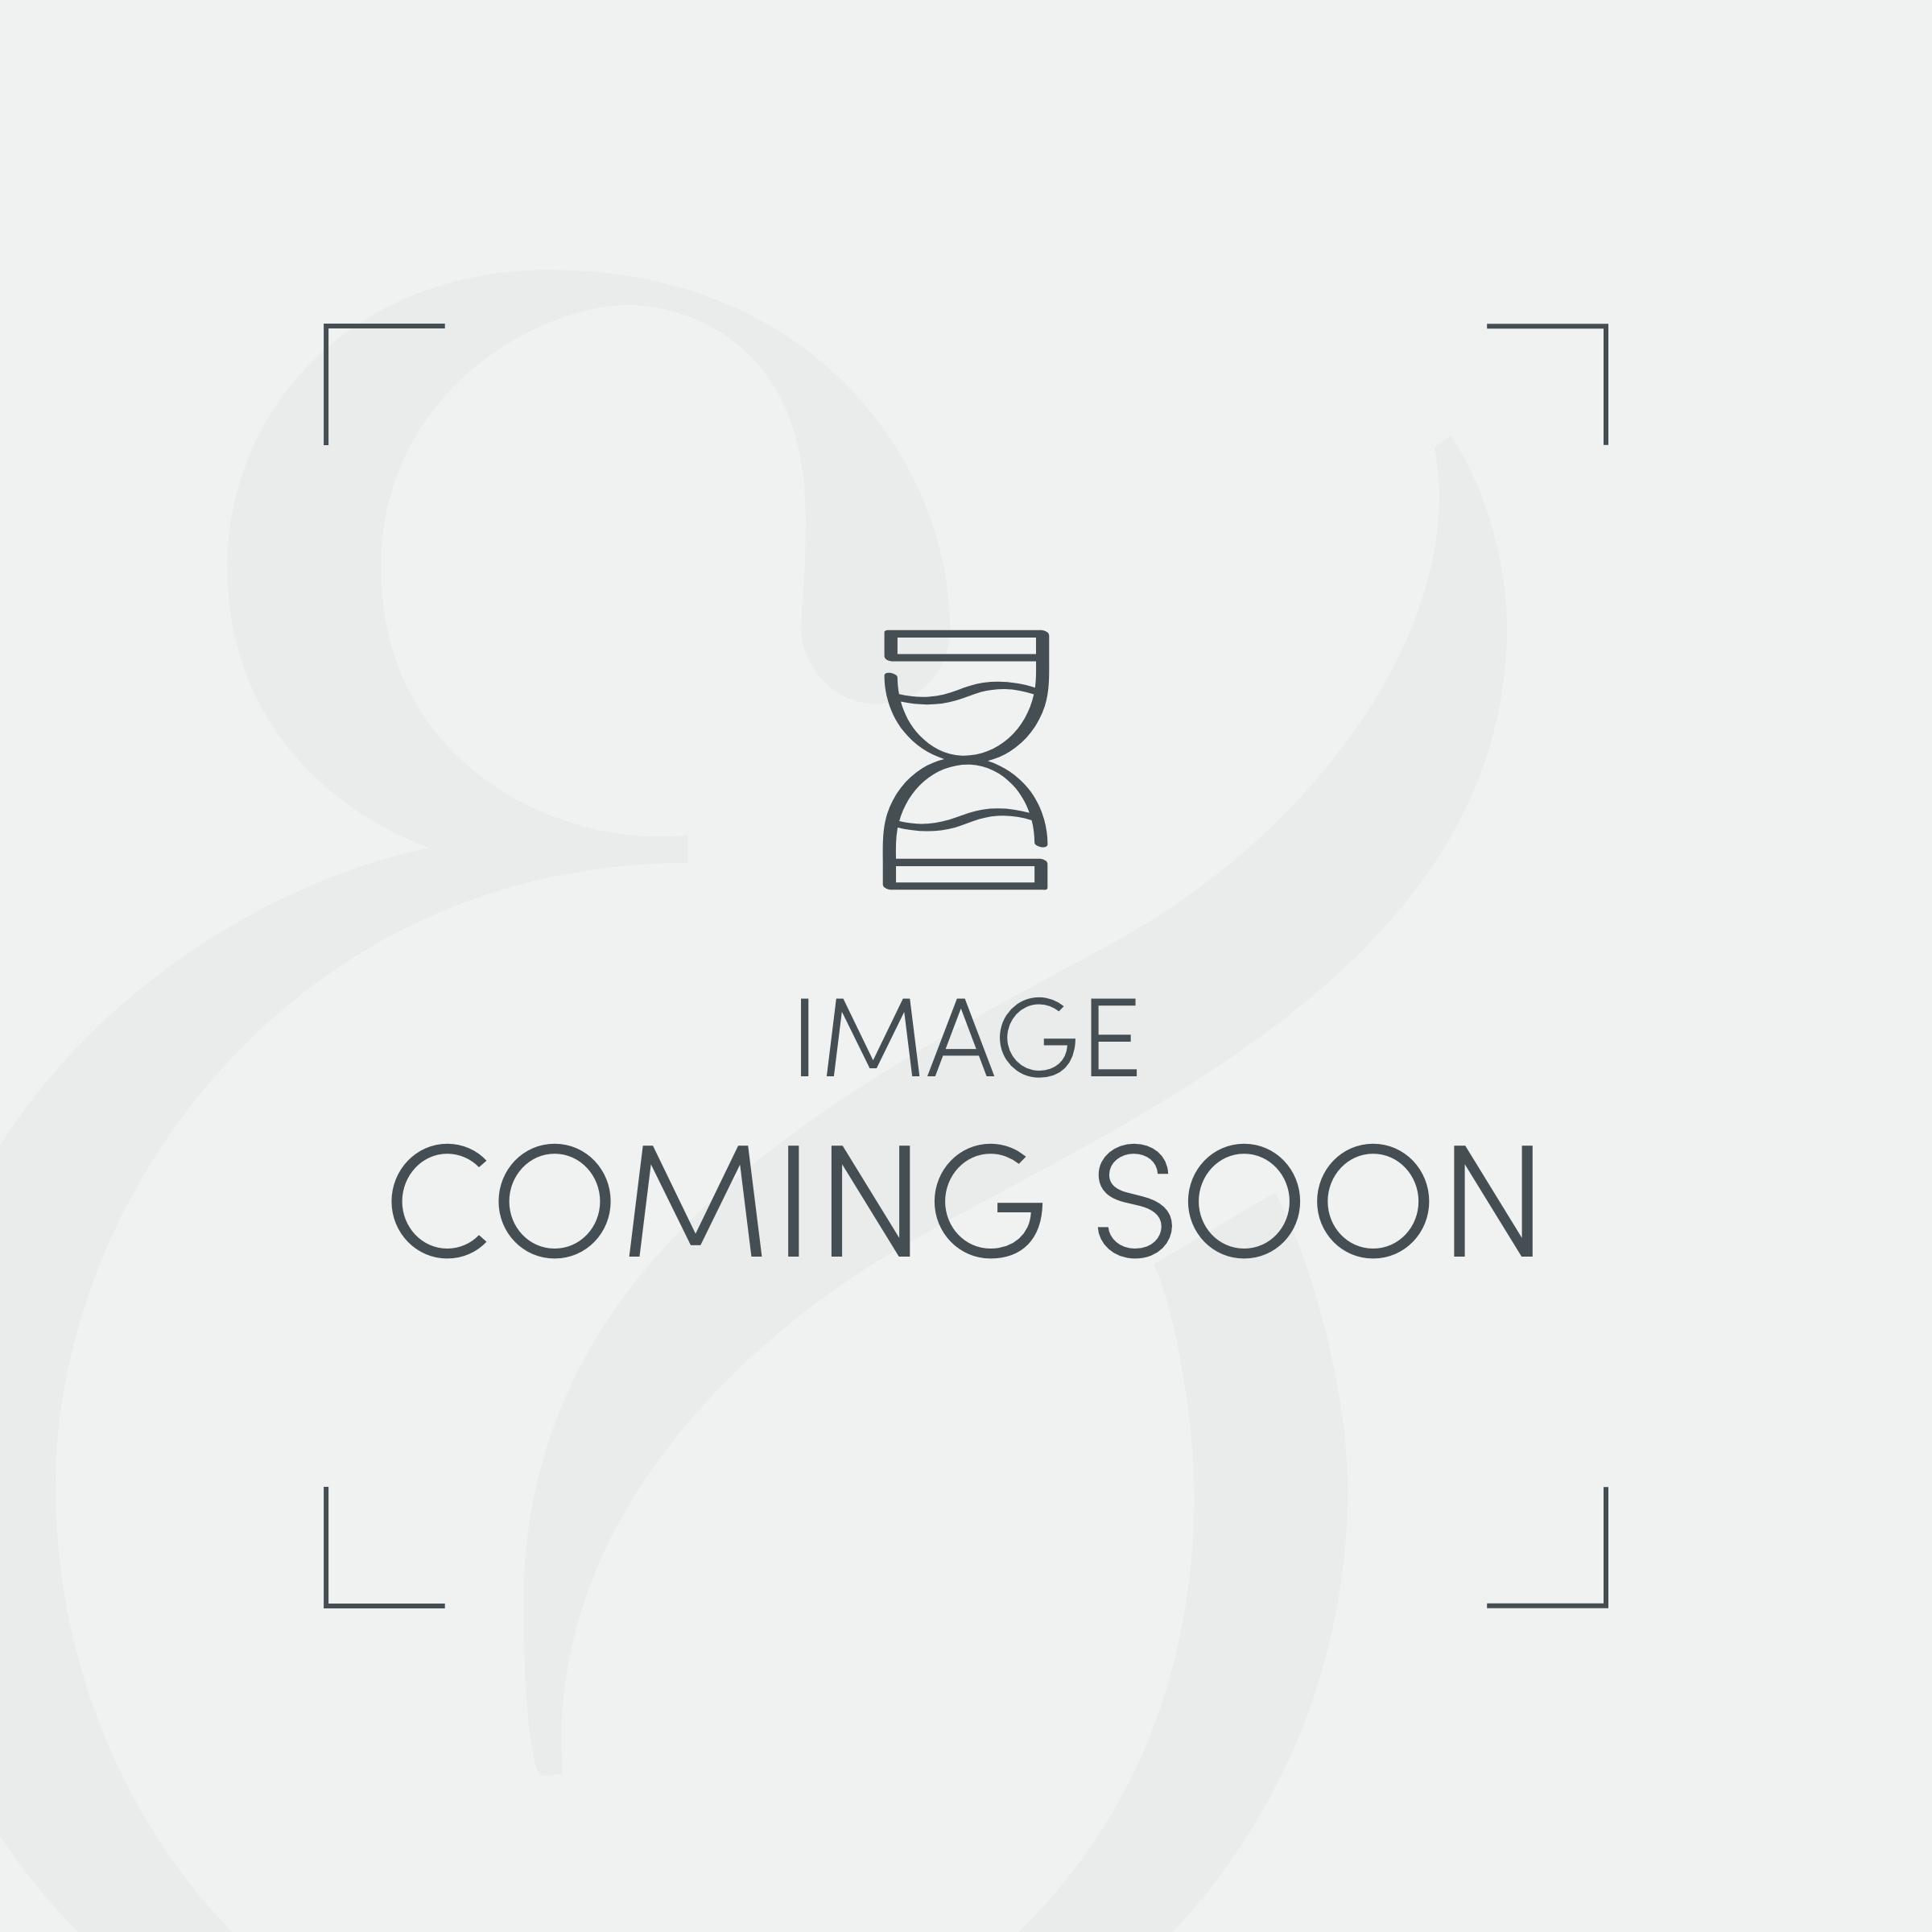 750GSM Supima Cotton Towel Bundles